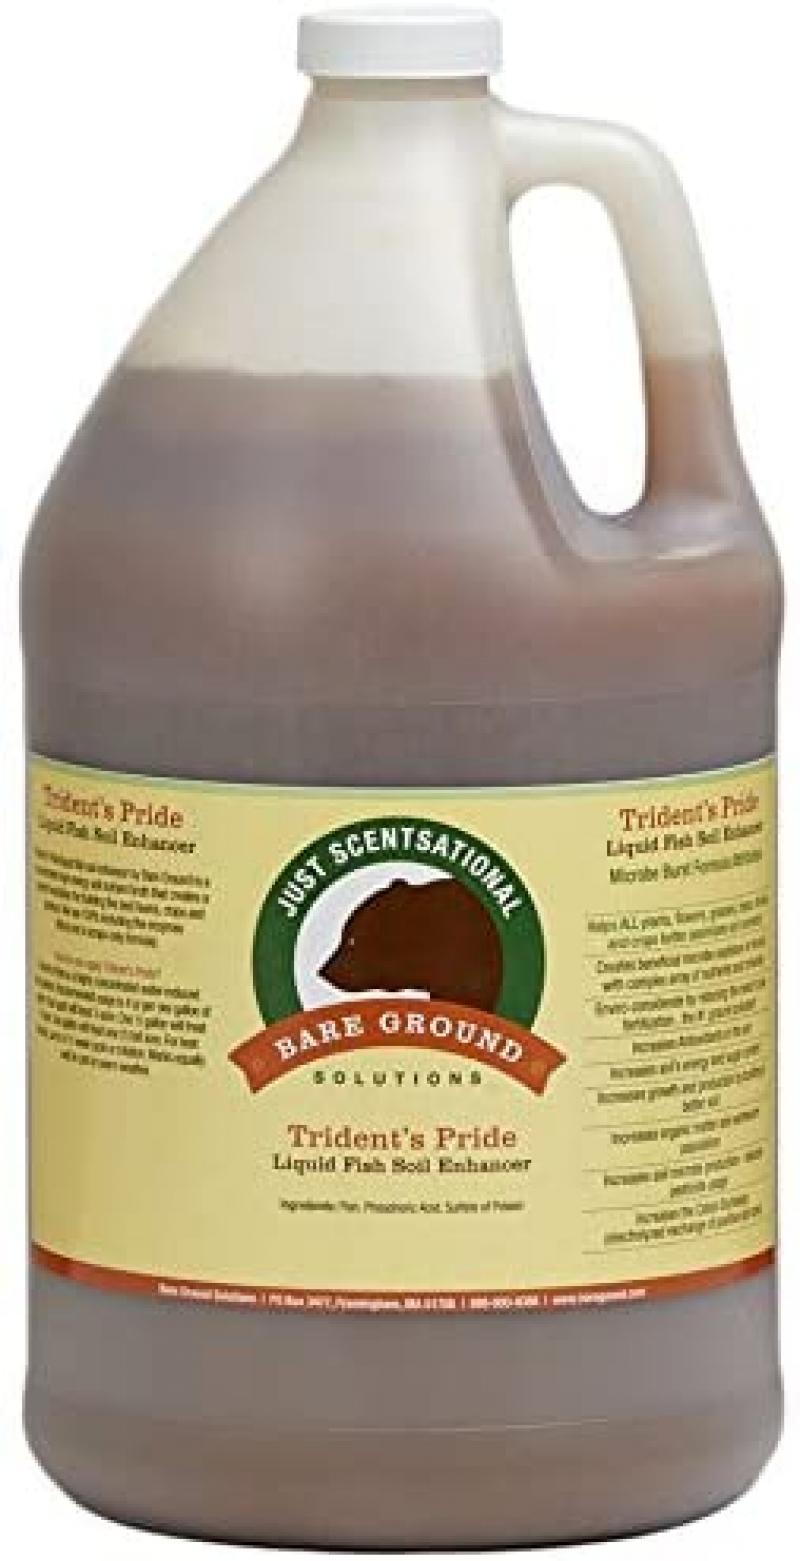 ihocon: Just Scentsational TP-128G Trident's Pride Organic Liquid Fish Hydroponic Soil Fertilizer, 128 oz (1 Gallon) 魚肥 (肥料)